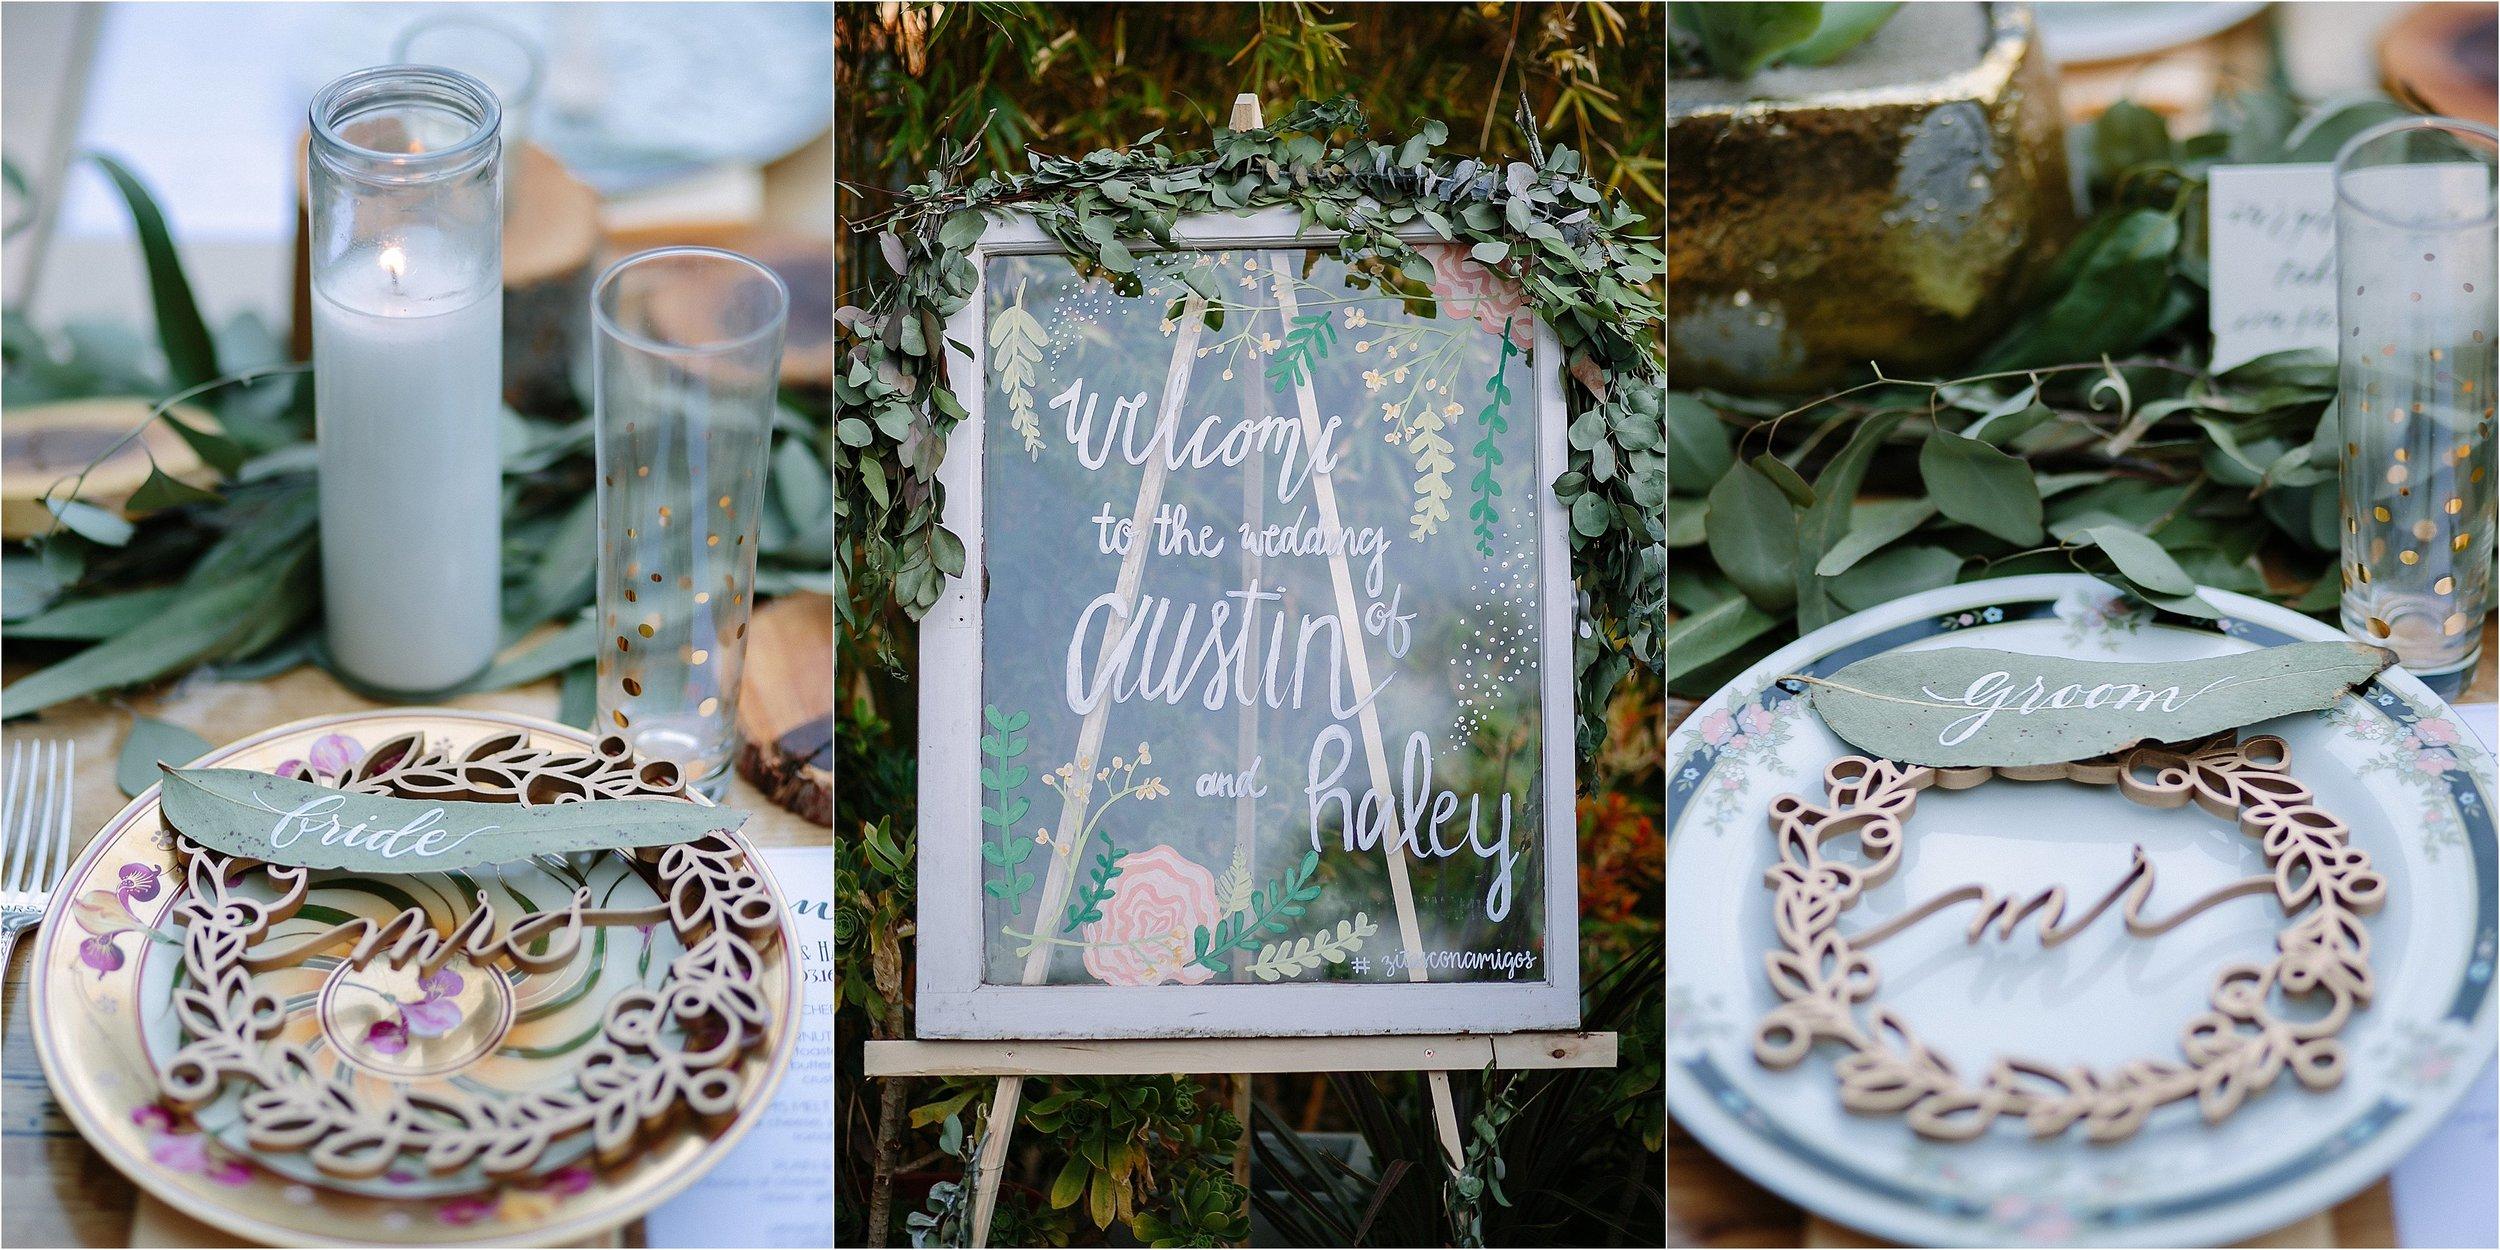 Handmade Wedding Welcome Sign Photo